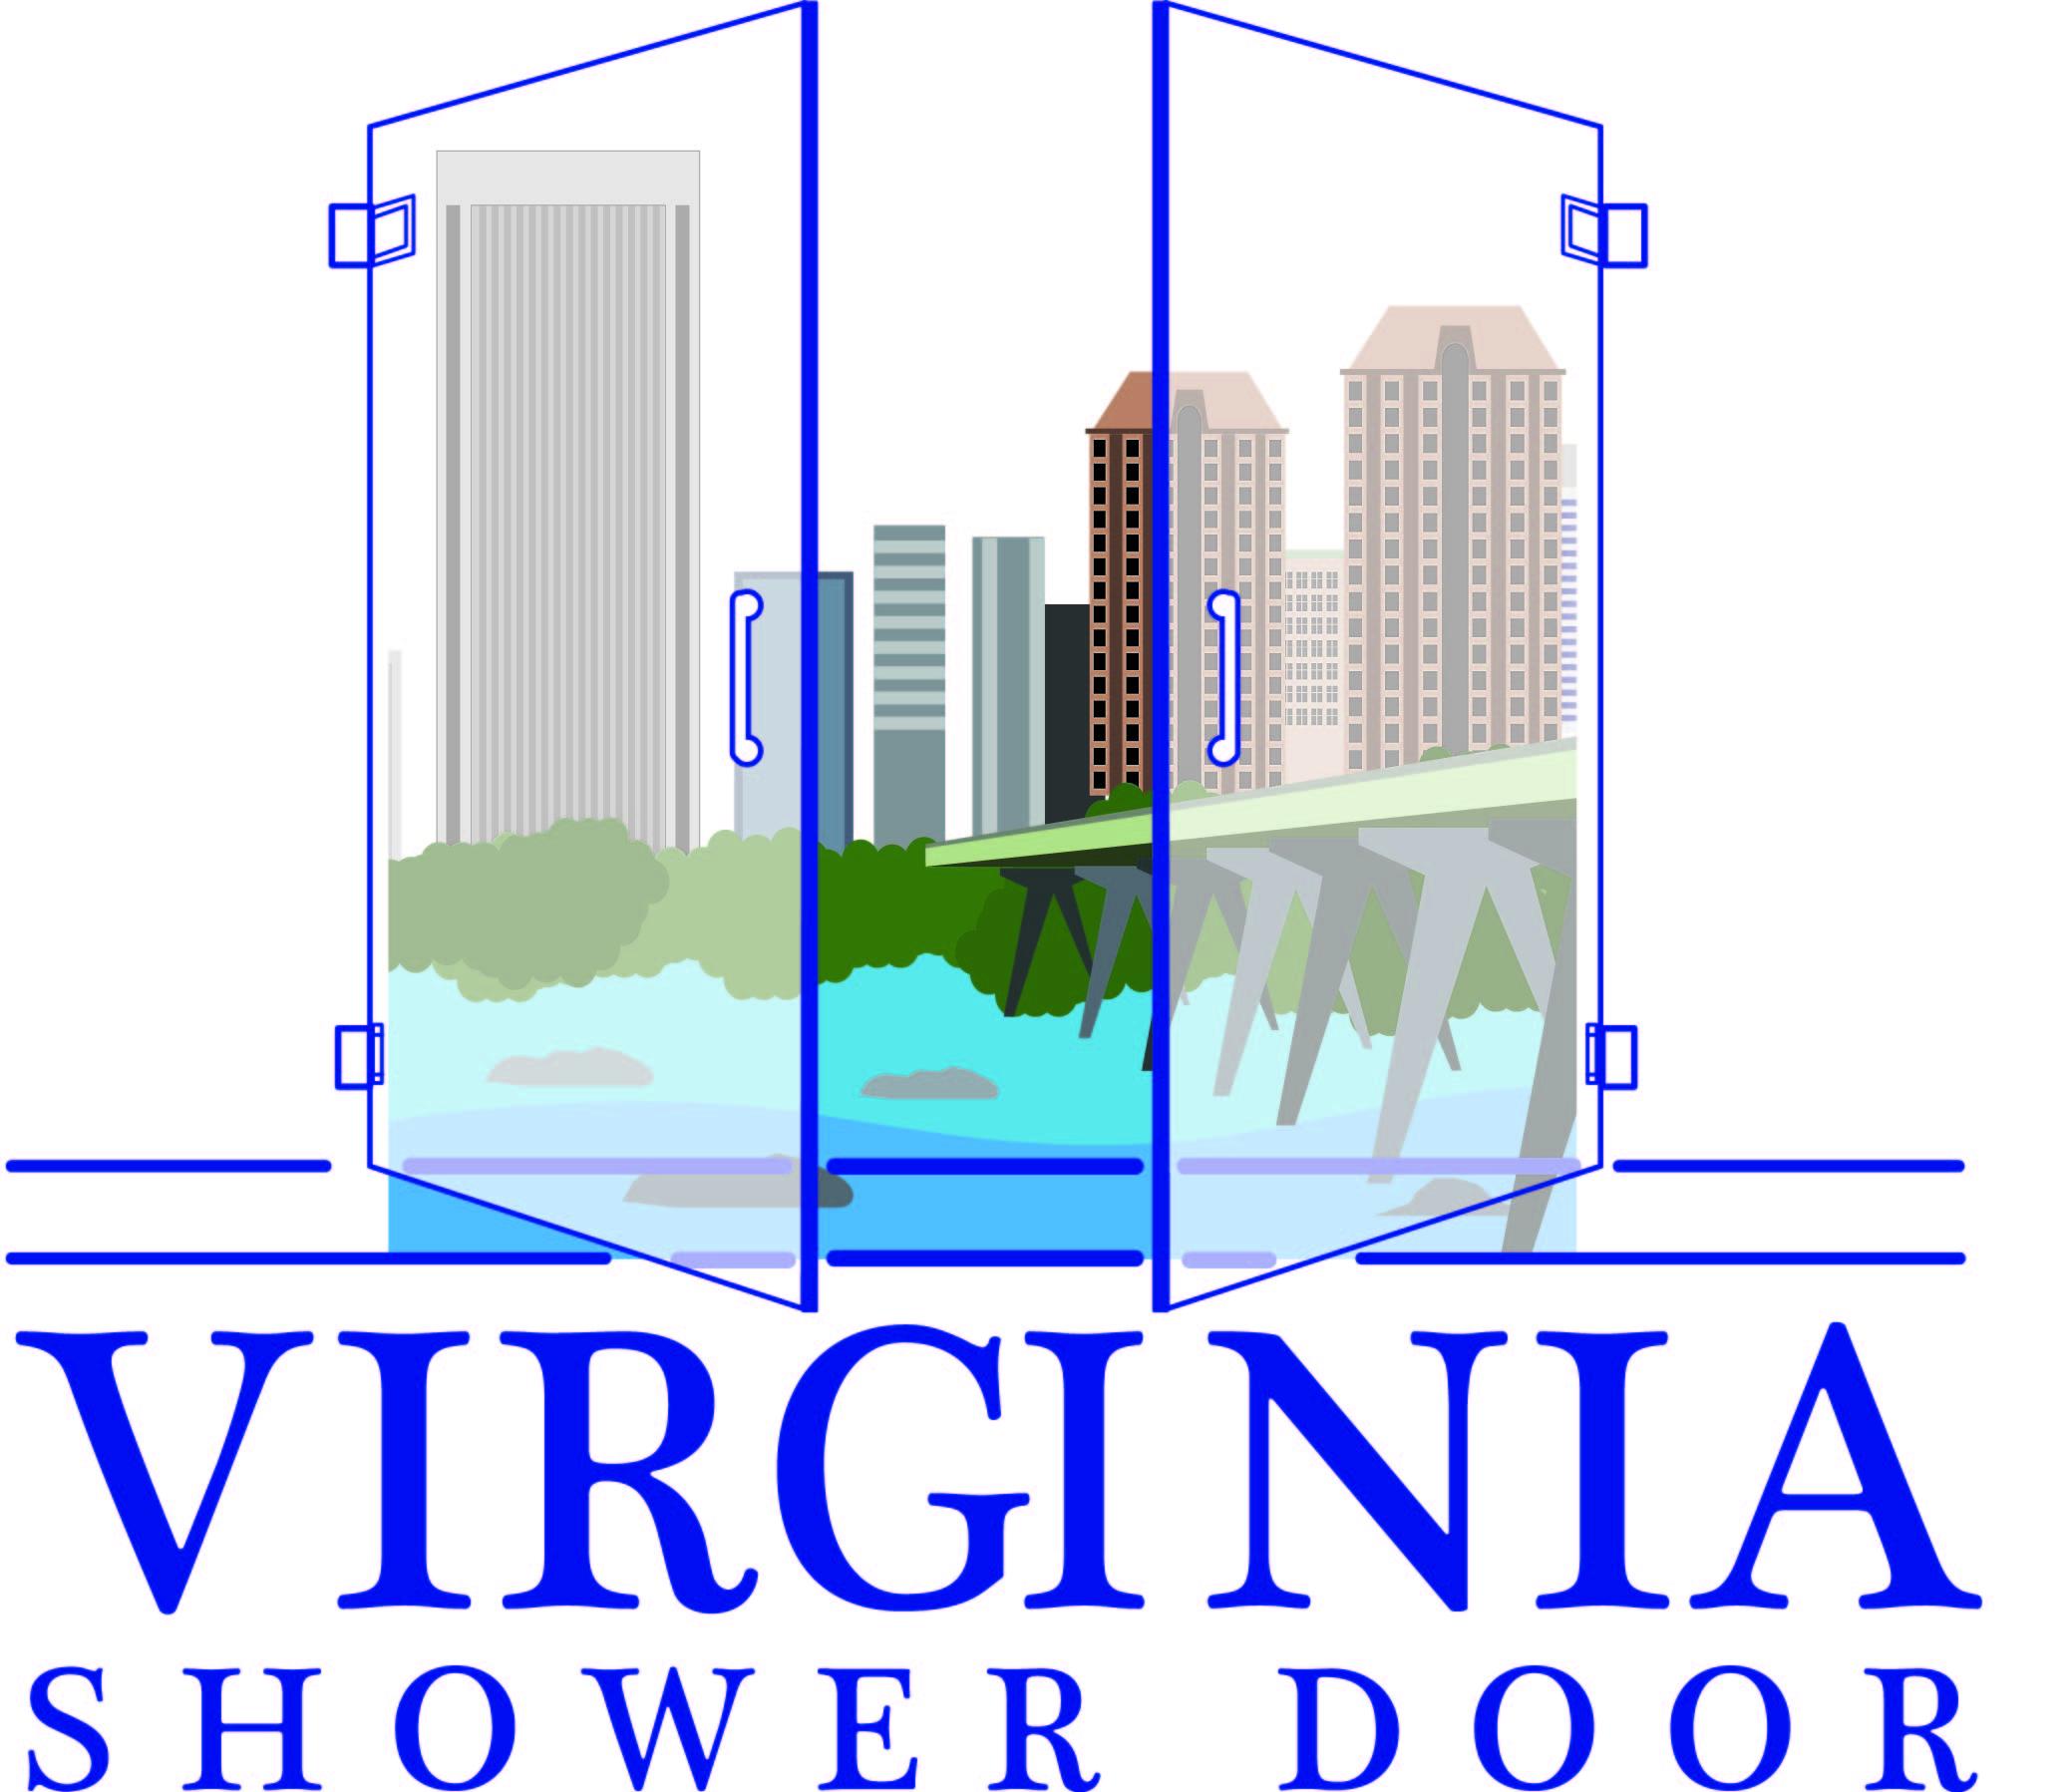 Va Shower Door LOGO Revised